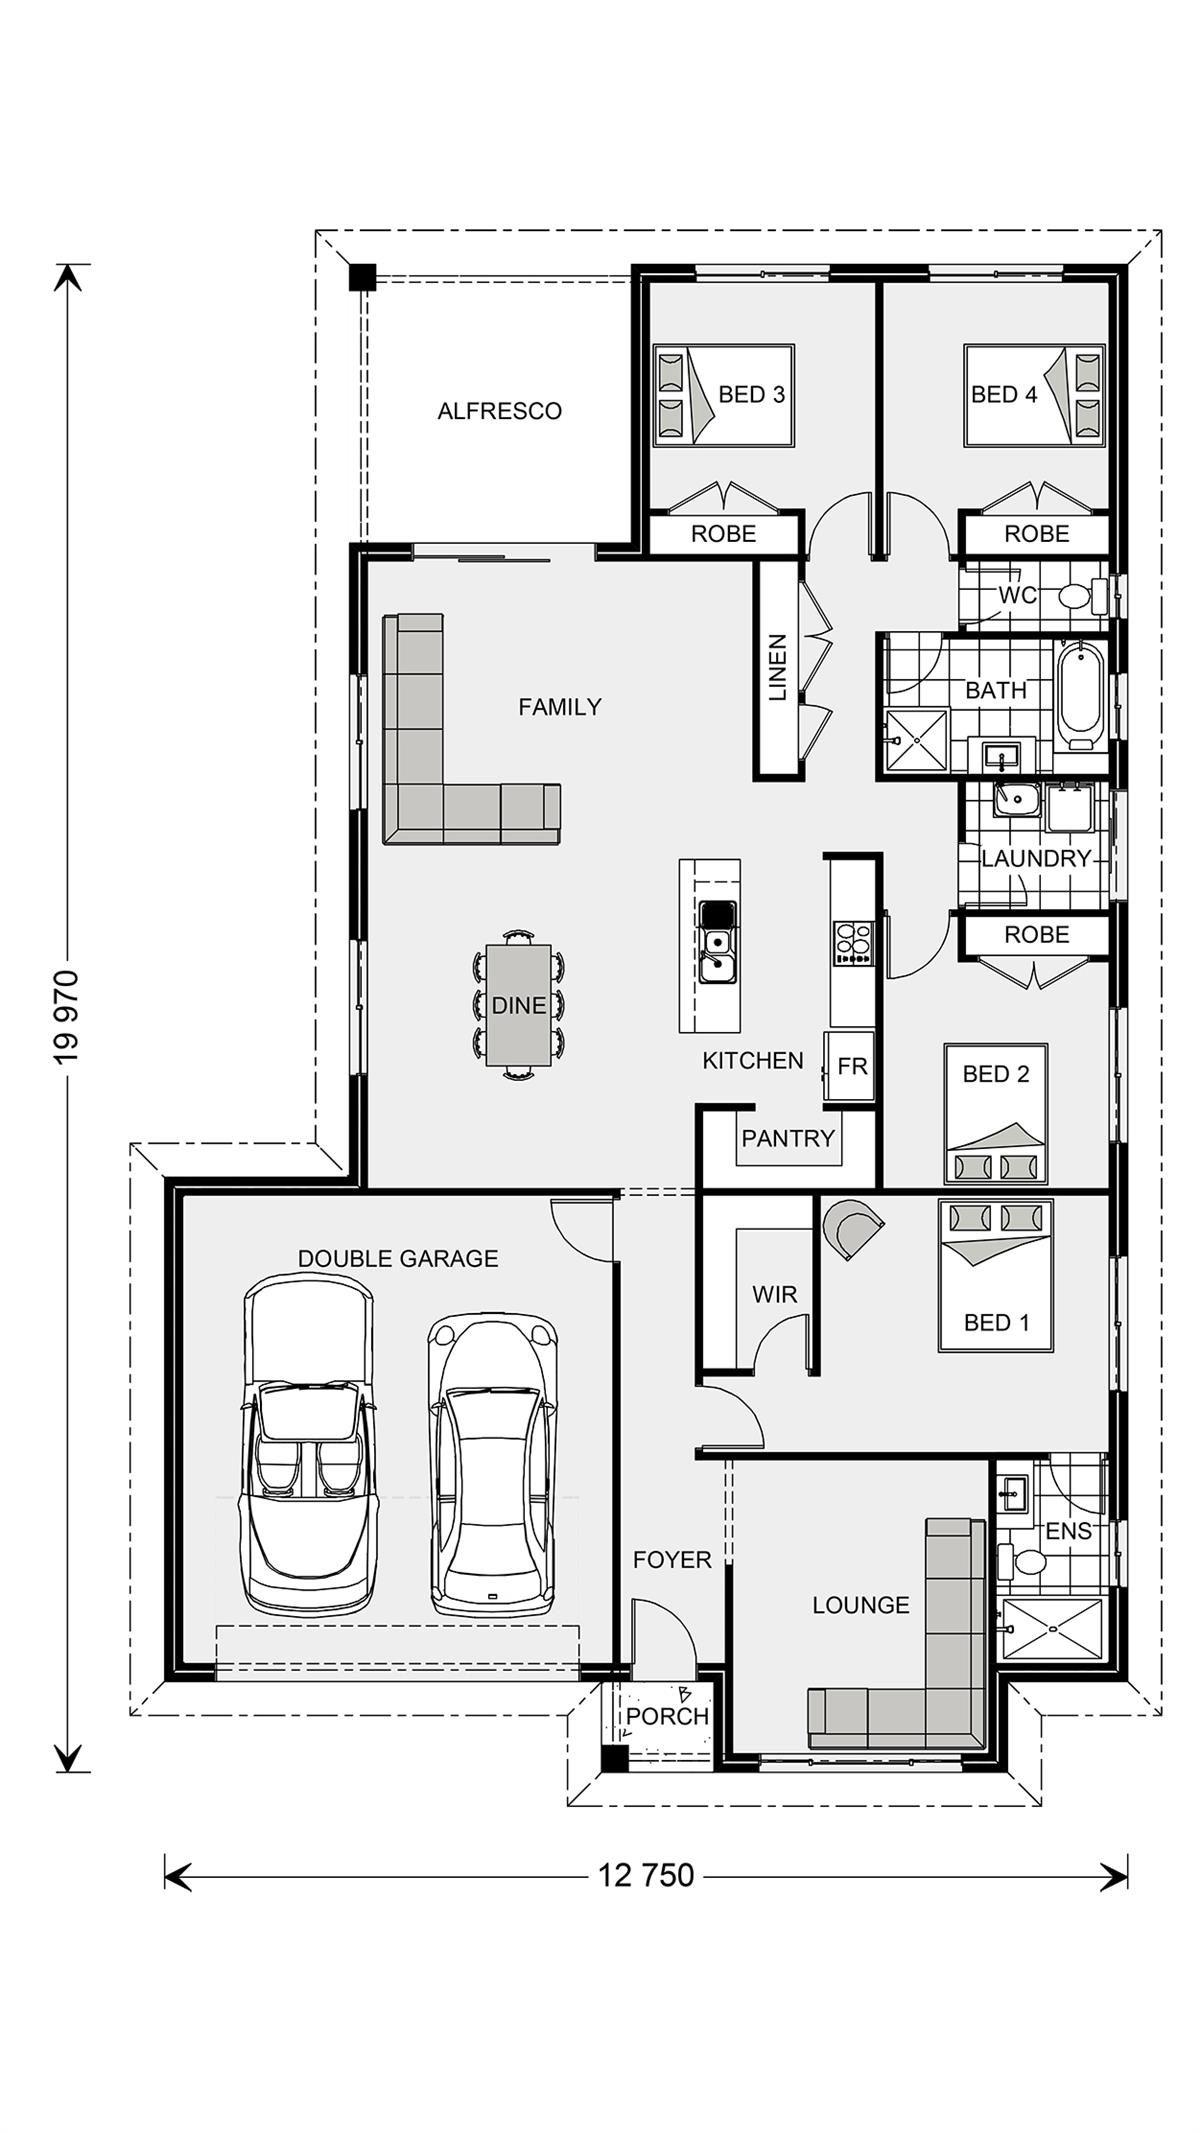 Woodridge 216 Express Series Home Designs In Port Macquarie Plan Maison Maison